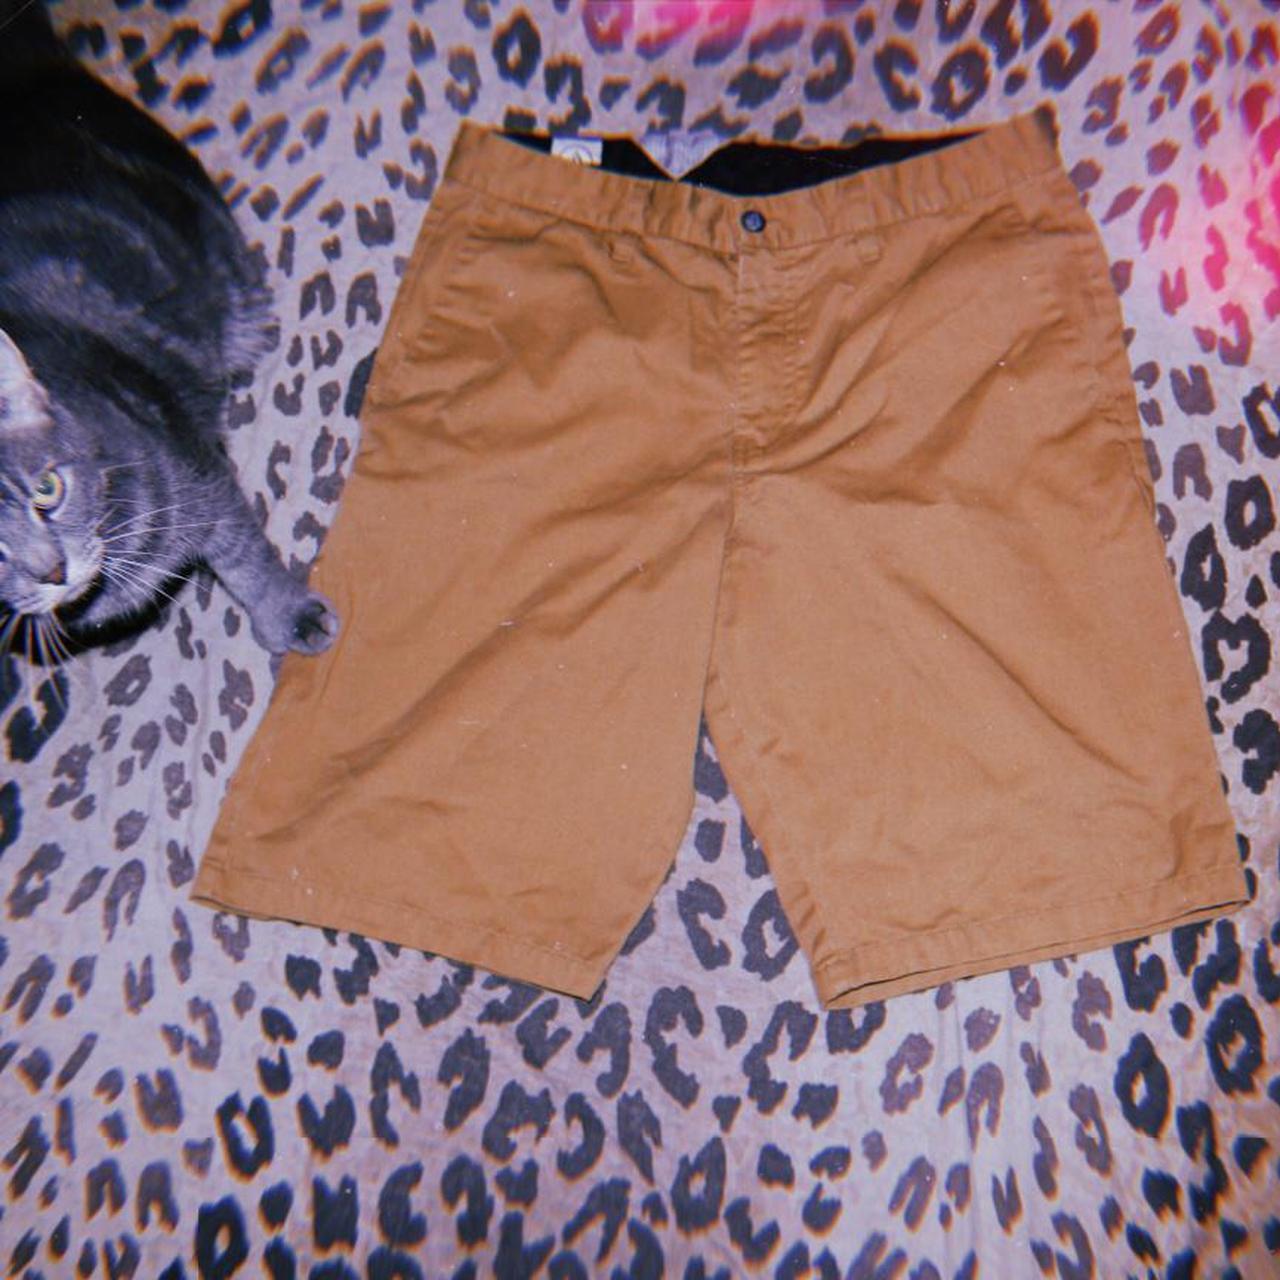 Product Image 1 - Tan / khaki #Volcom shorts.  All